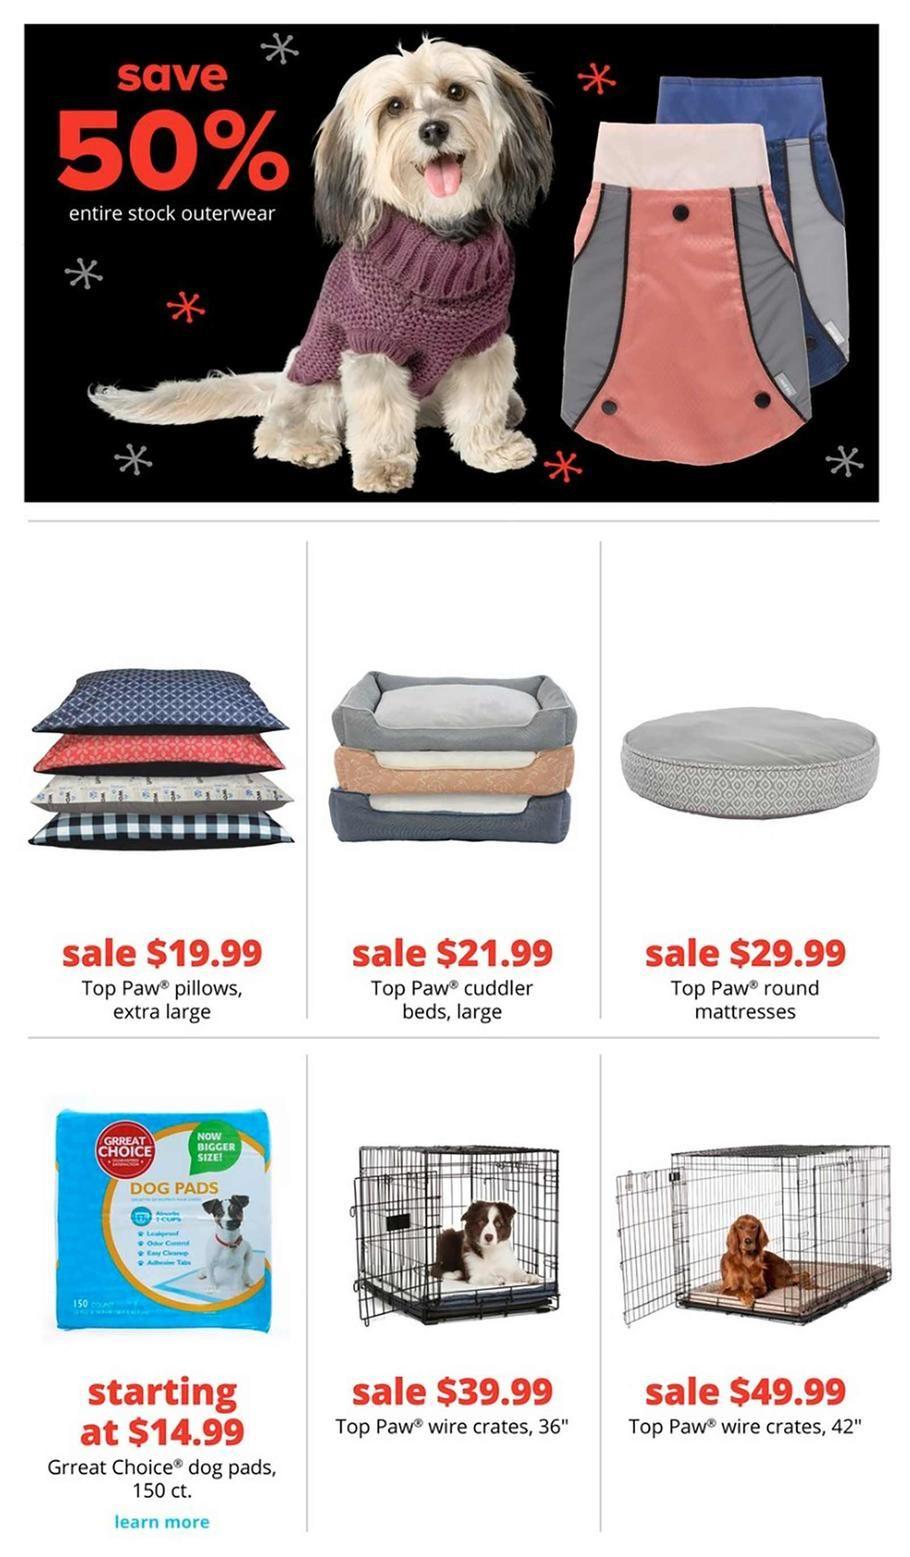 Petsmart Black Friday Ad Scan Deals And Sales 2019 Page 5 Of 10 Dog Pads Black Friday Ads Petsmart